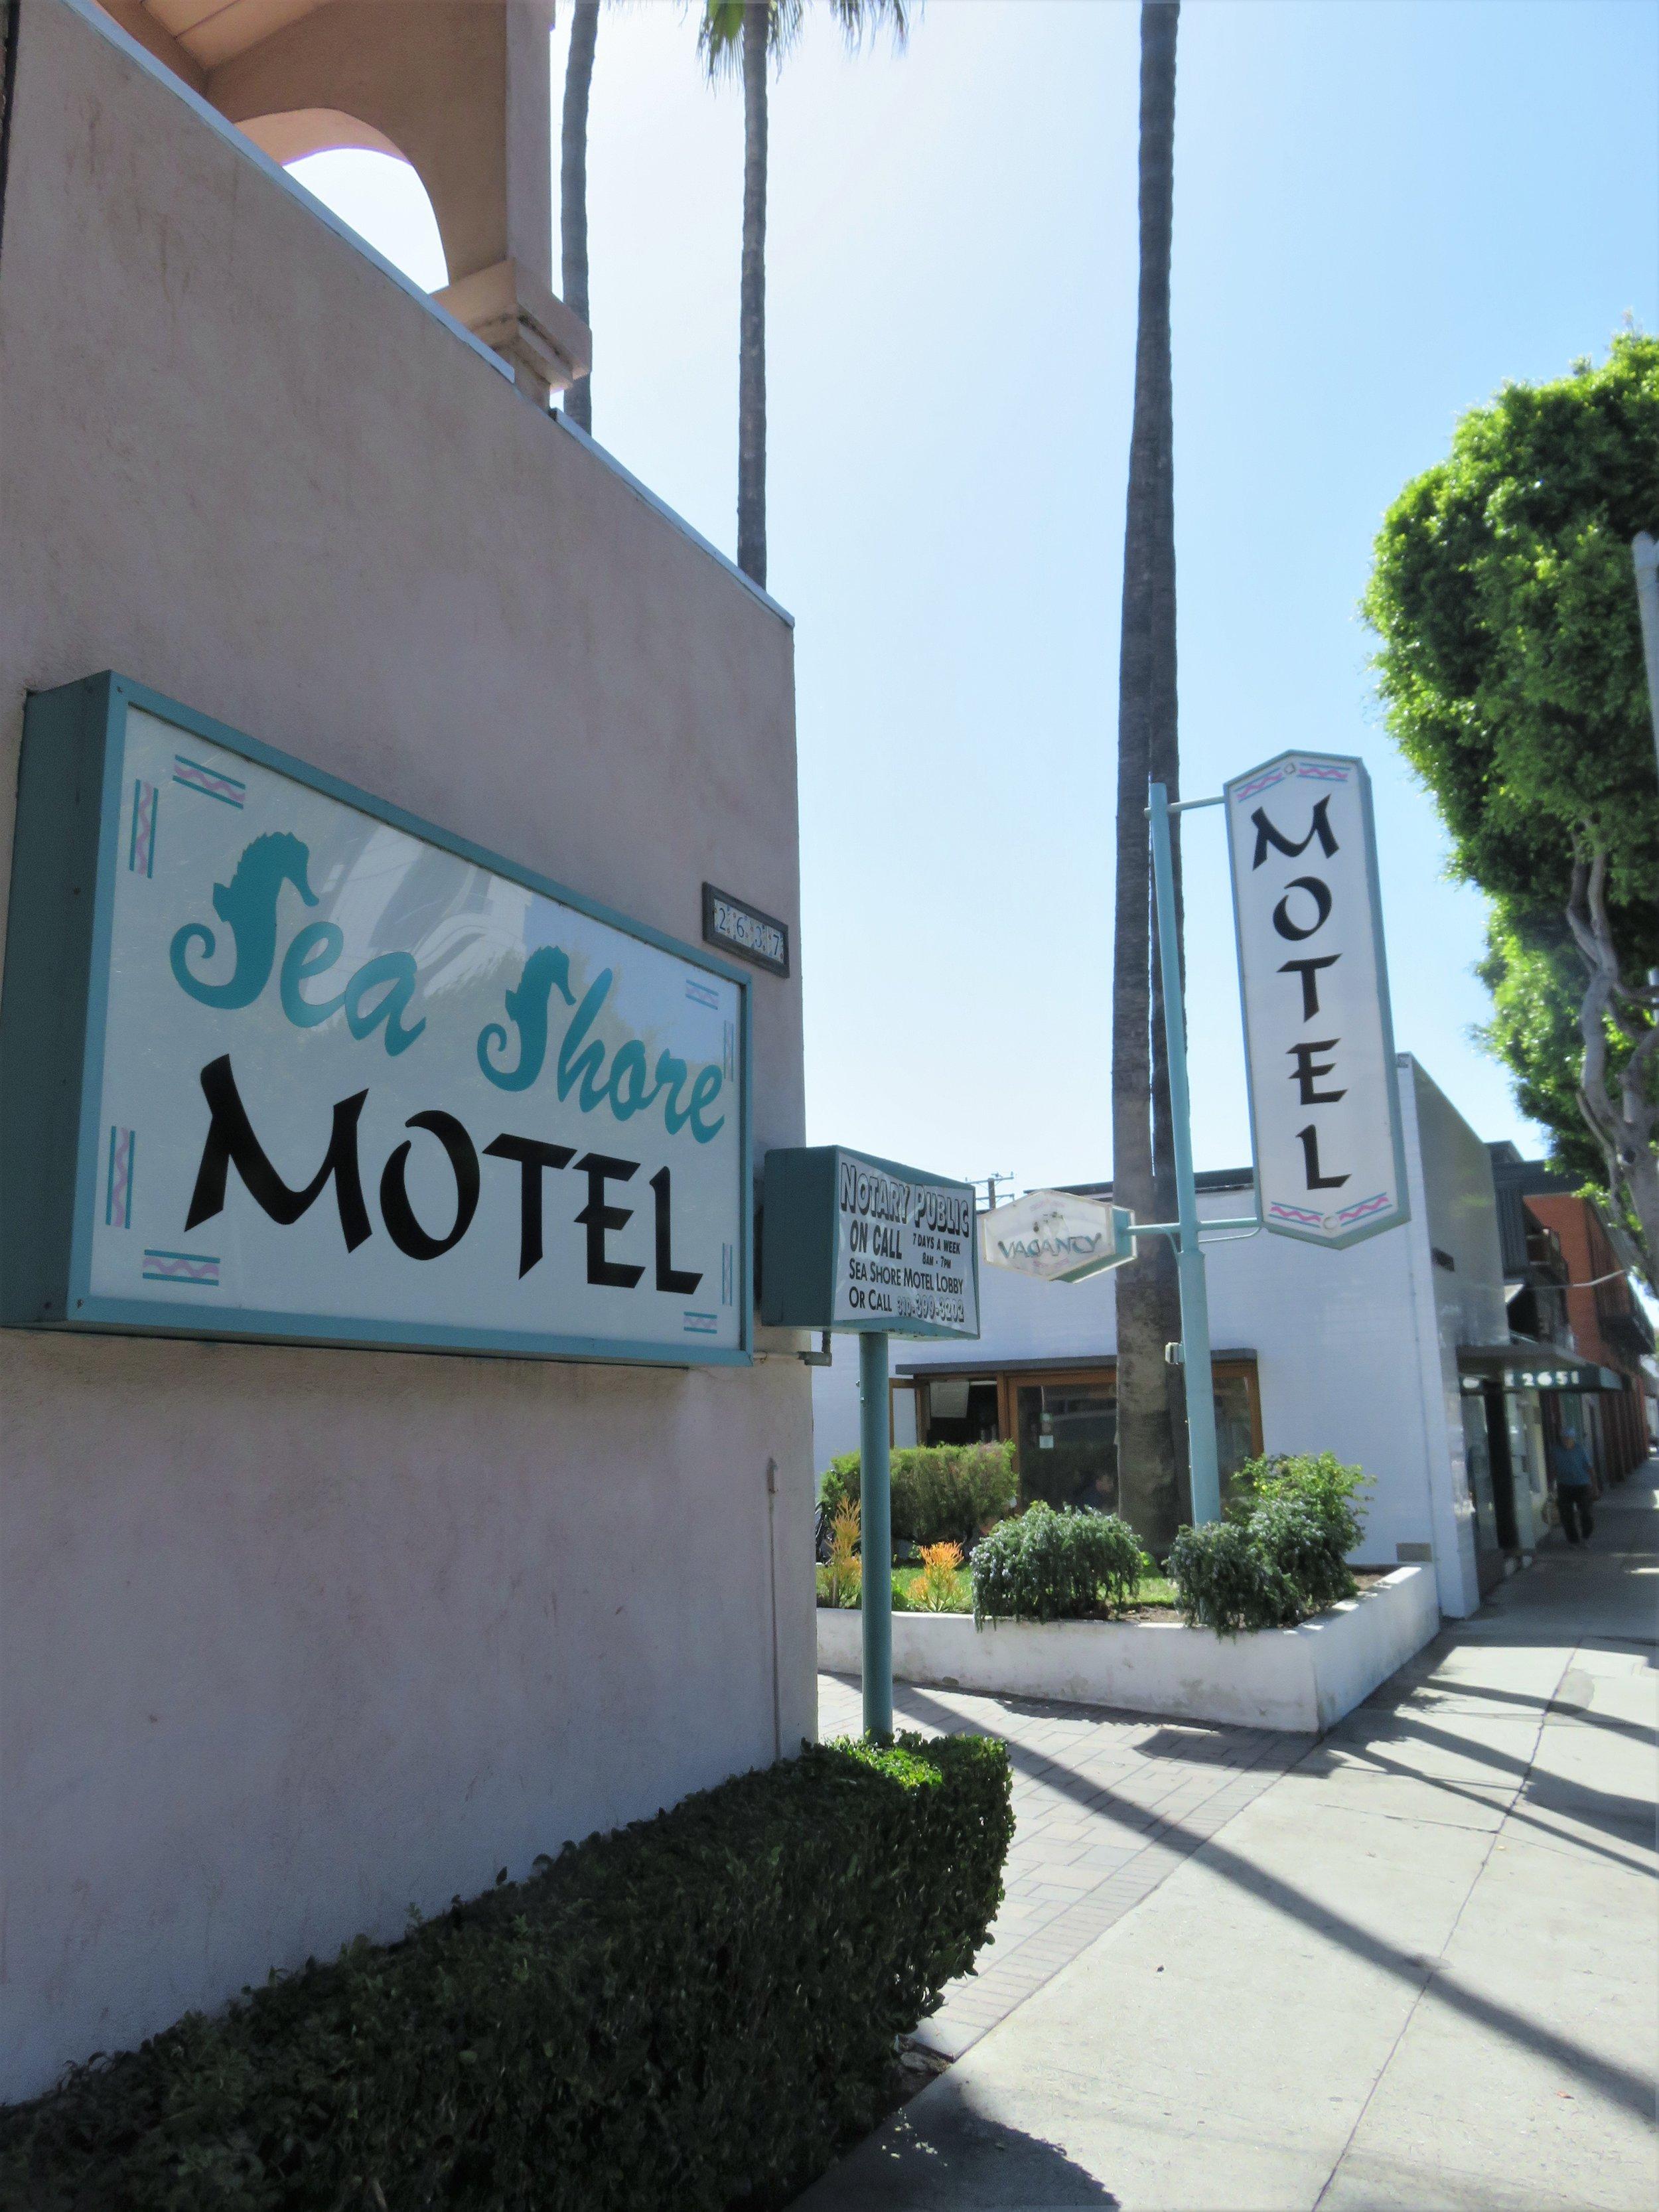 California hotels | Hotel deals | Beachfront hotels | Beach vacation | California vacation | Pacific coast | Budget hotels